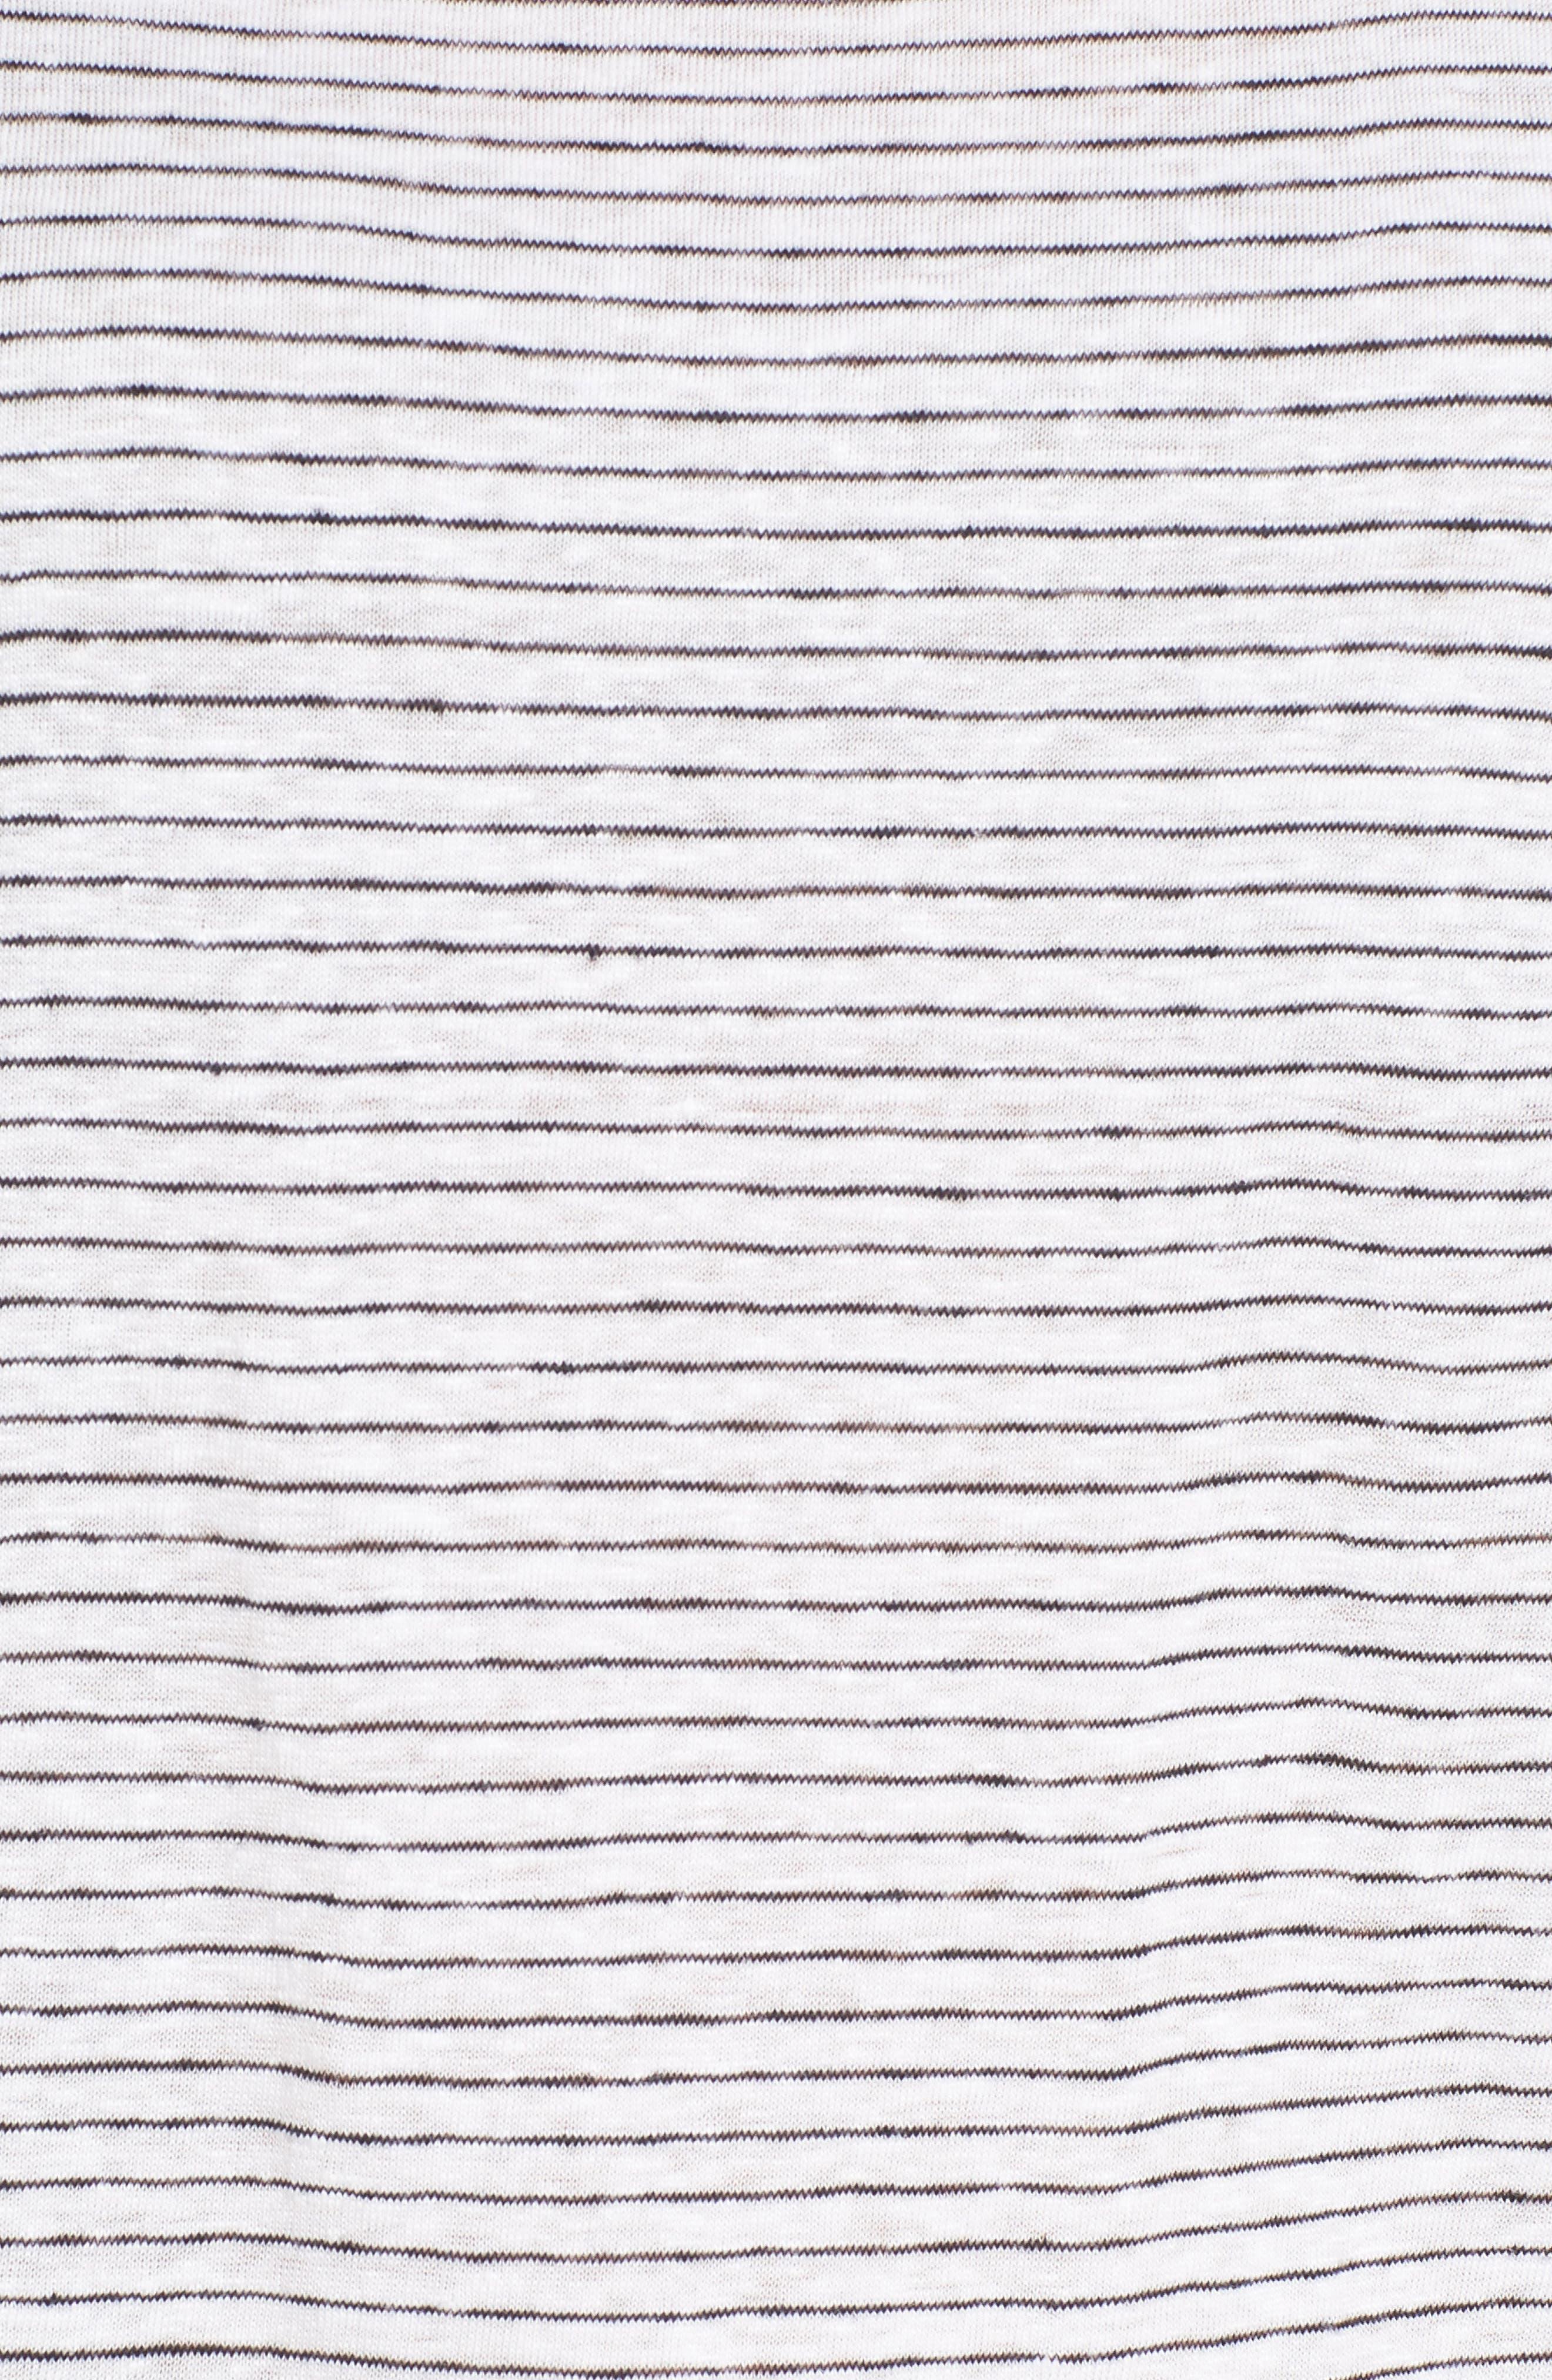 Organic Linen Tee,                             Alternate thumbnail 6, color,                             White/ Black